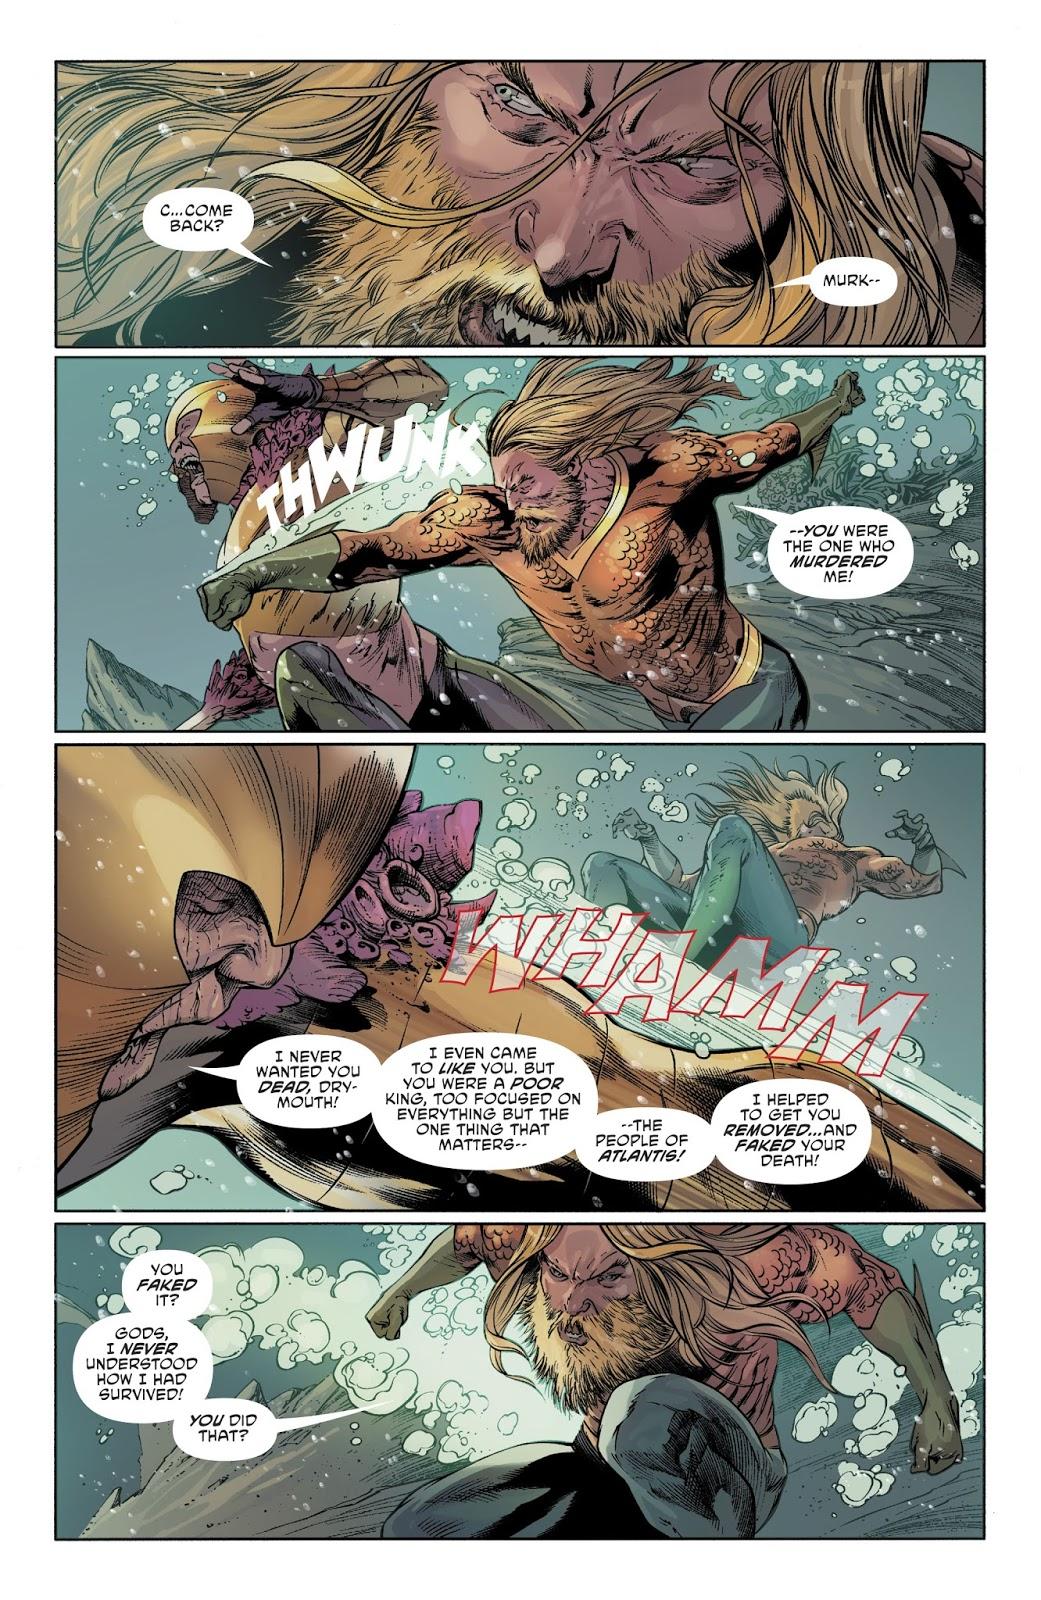 Why Murk Betrayed Aquaman